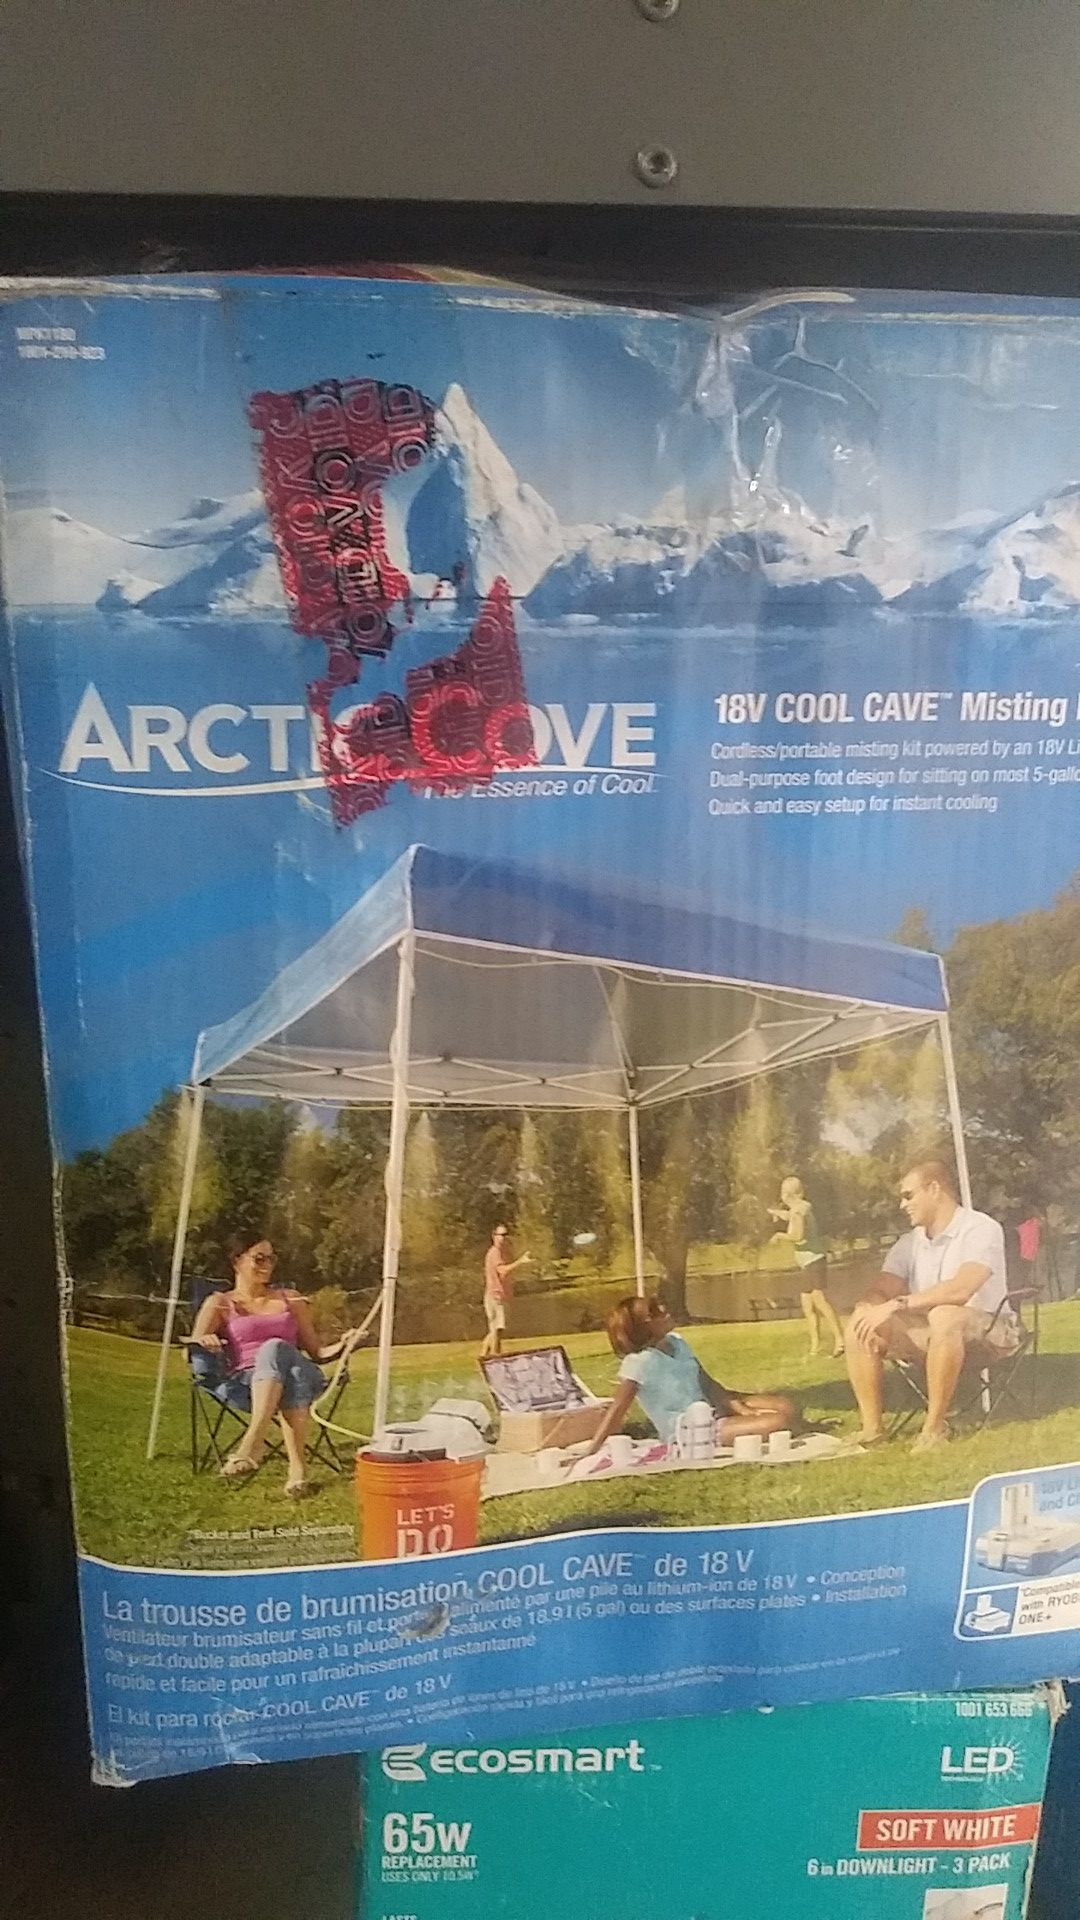 ARCTIC COVE. 18V COOL CAVE MISTING KIT